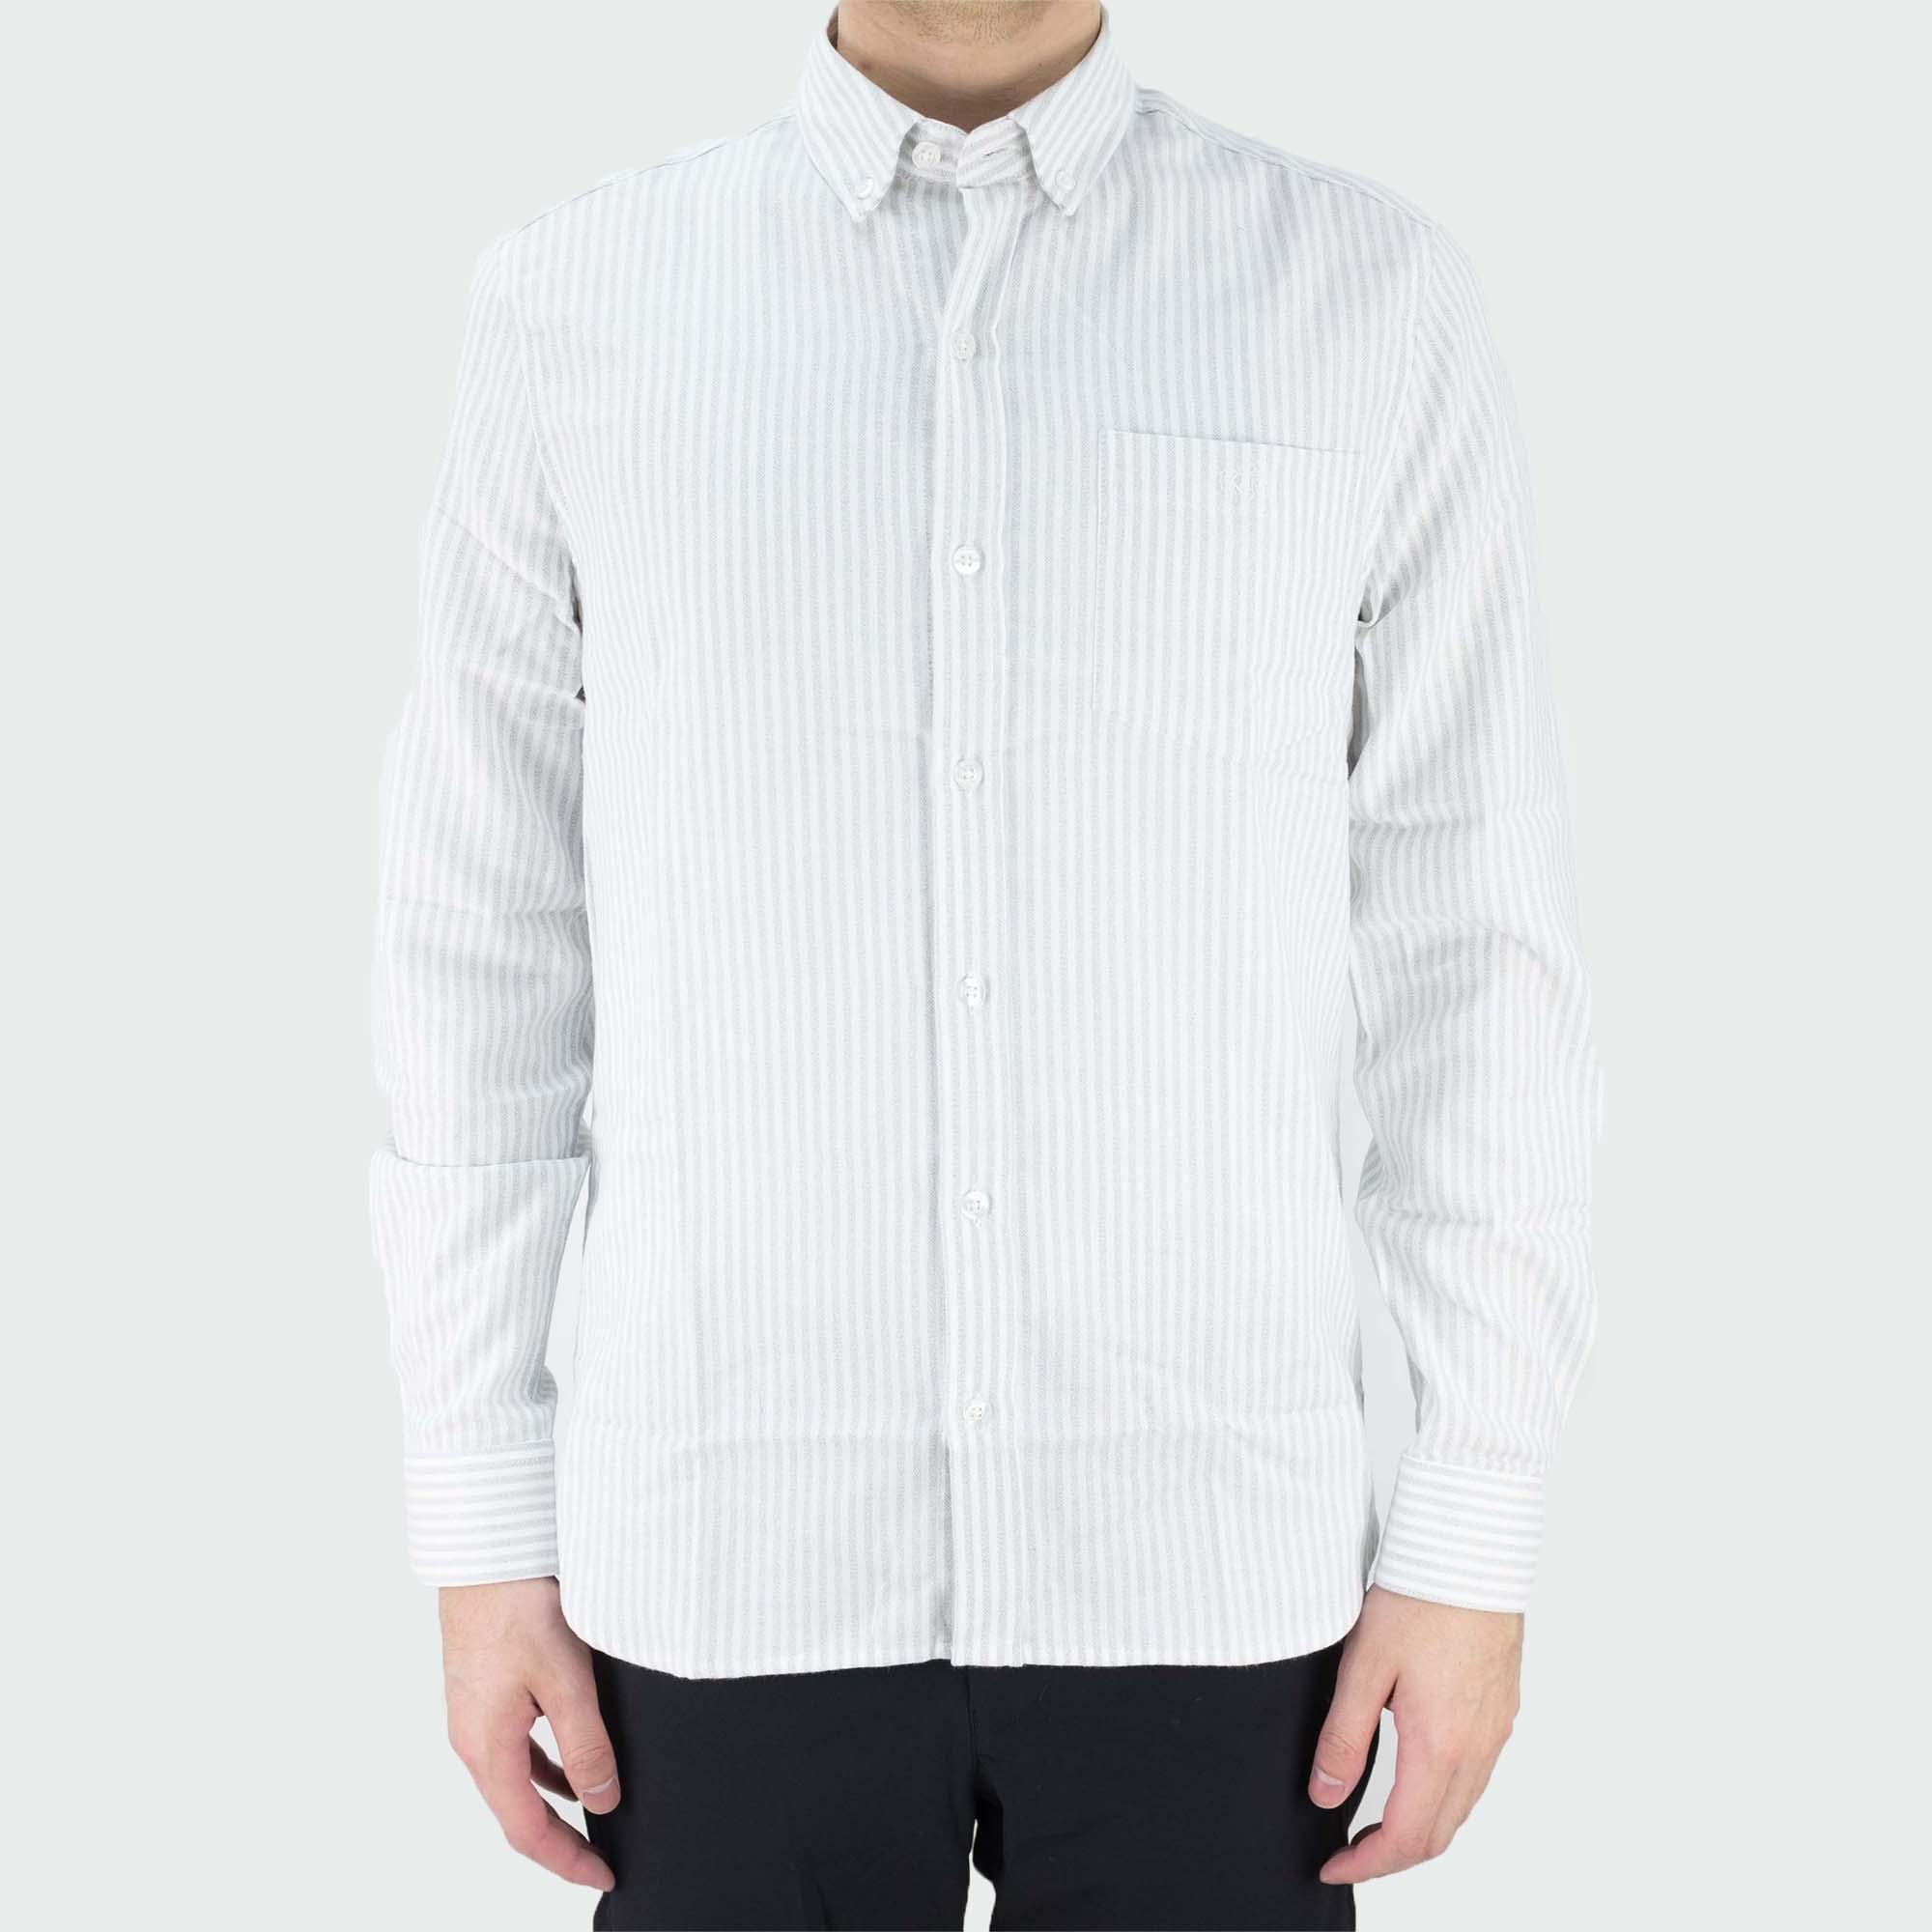 forét Beam Shirt - White/Light Grey